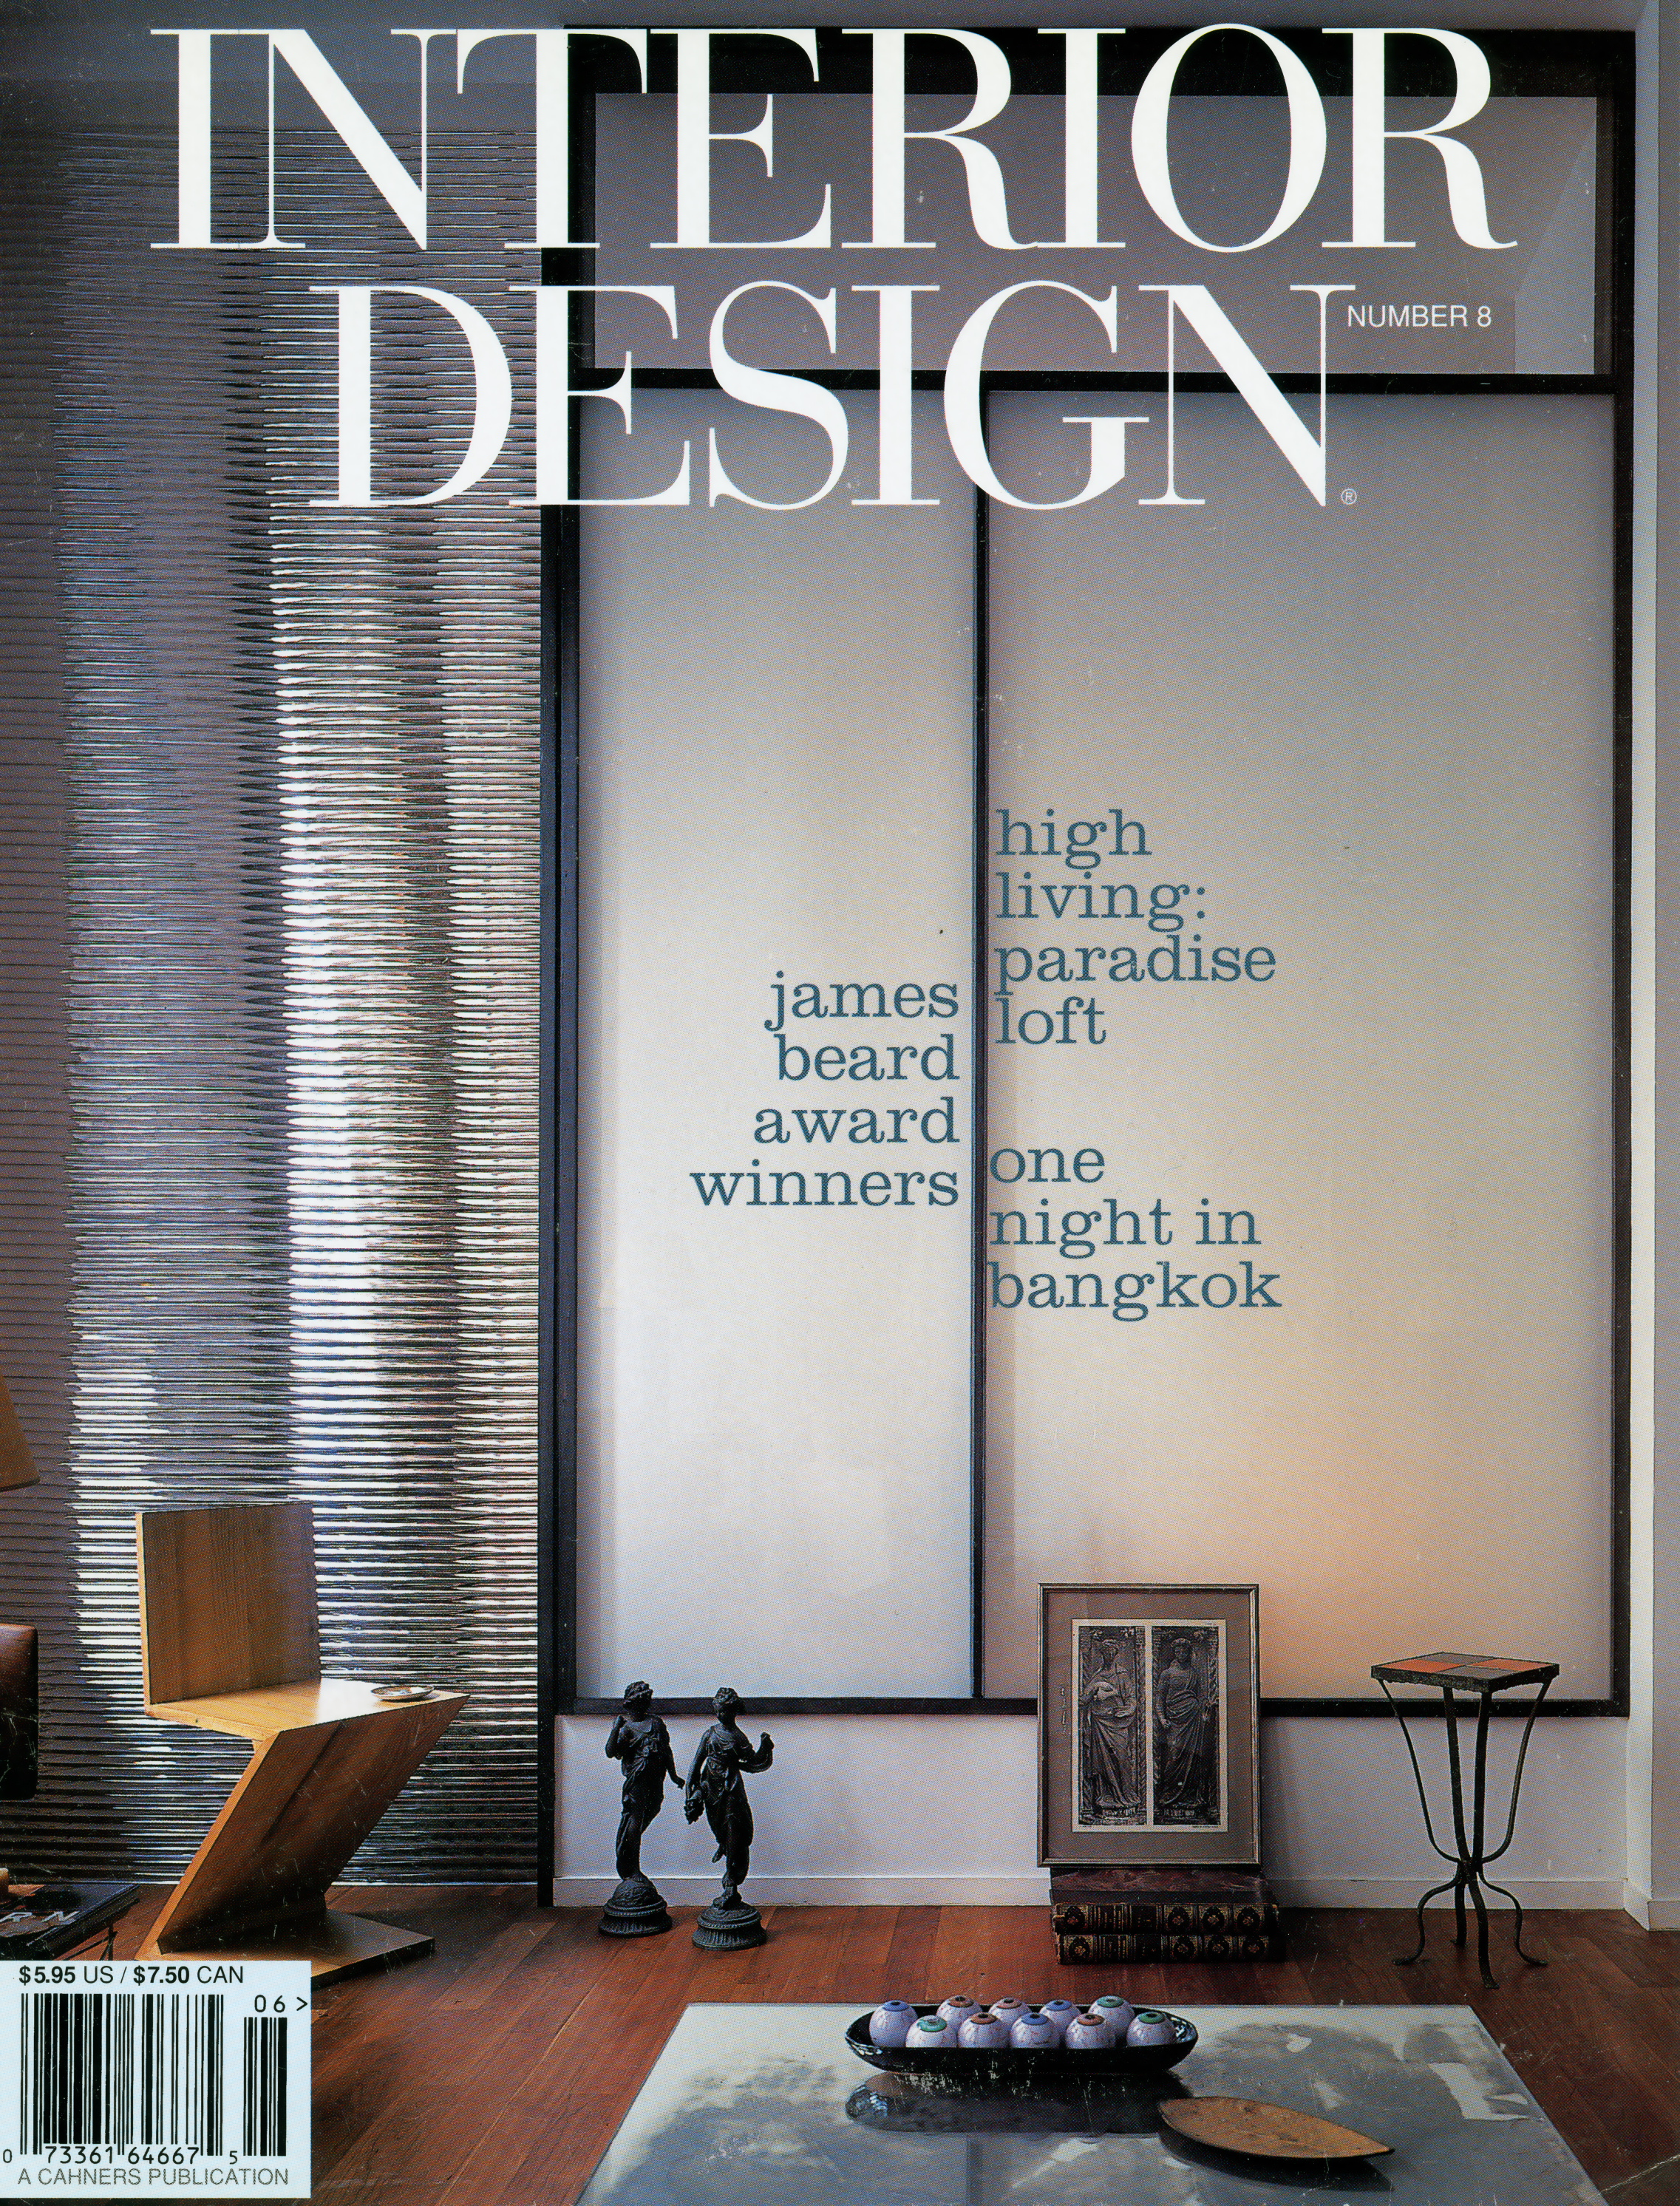 Interior Design 1996 1.JPG